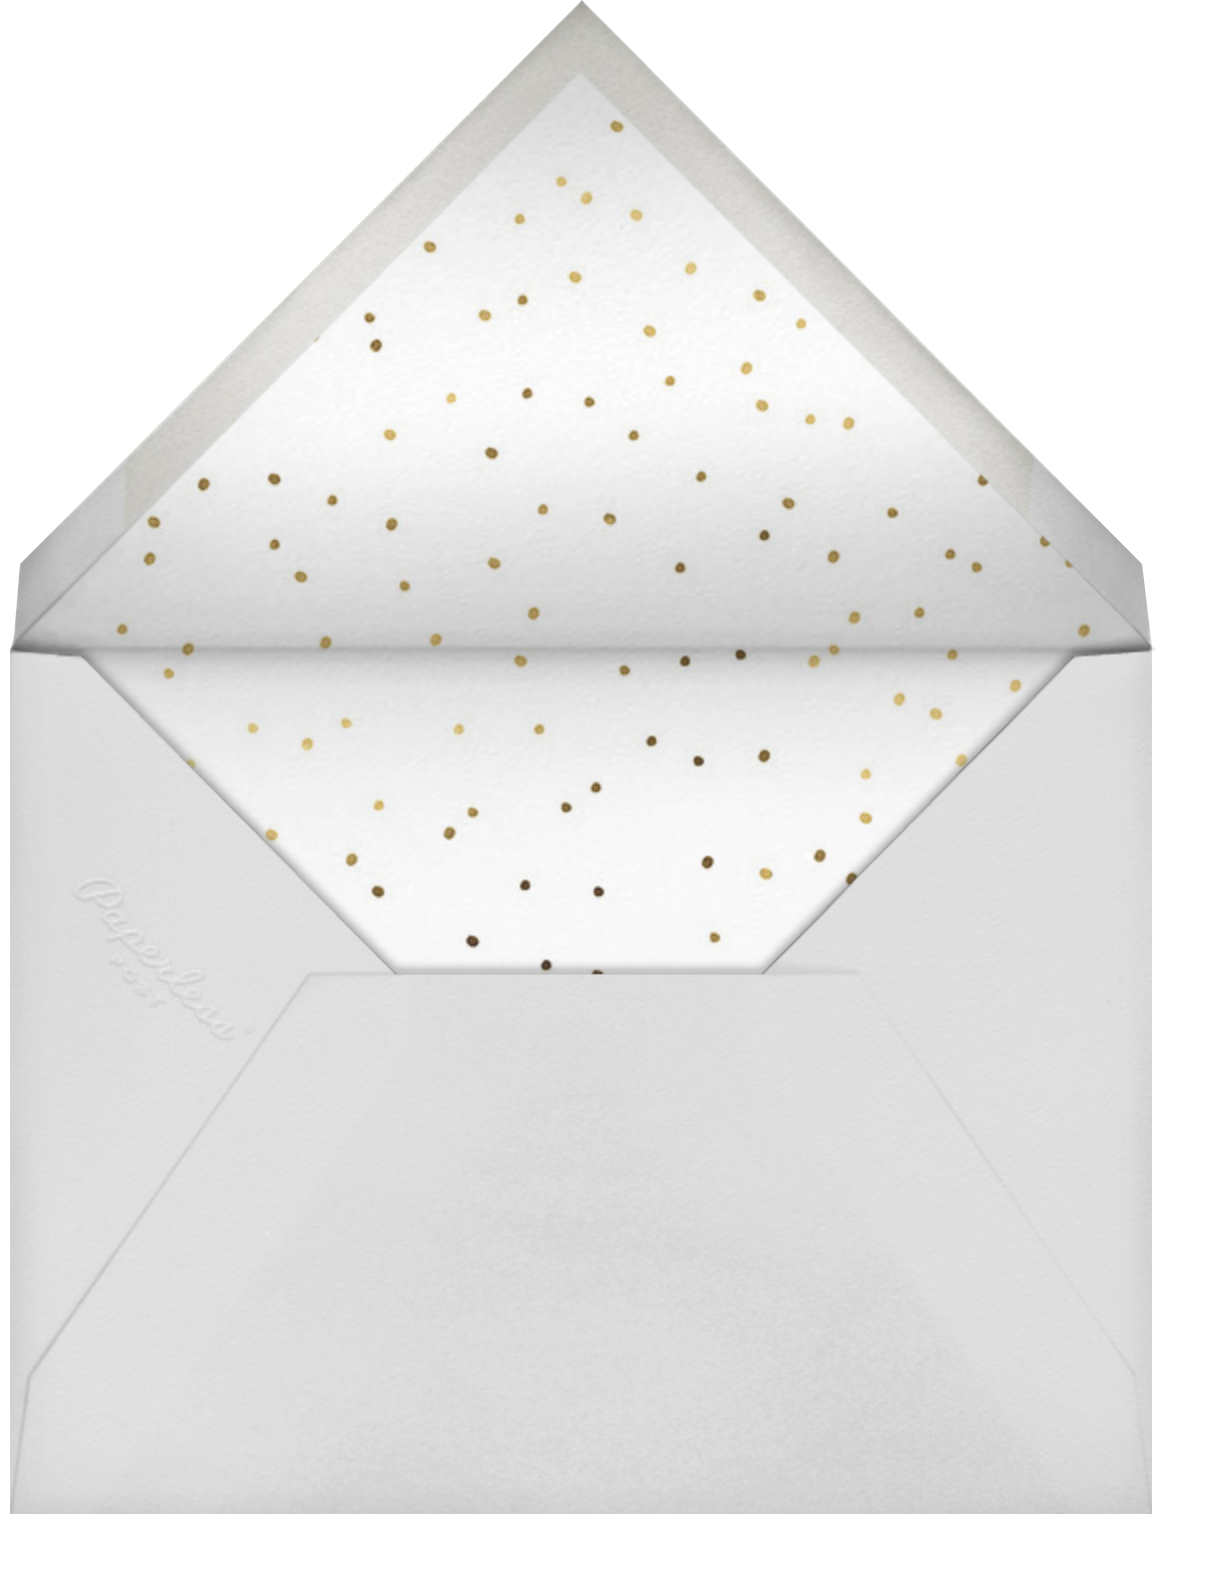 Xmas Heart - Sugar Paper - Christmas party - envelope back